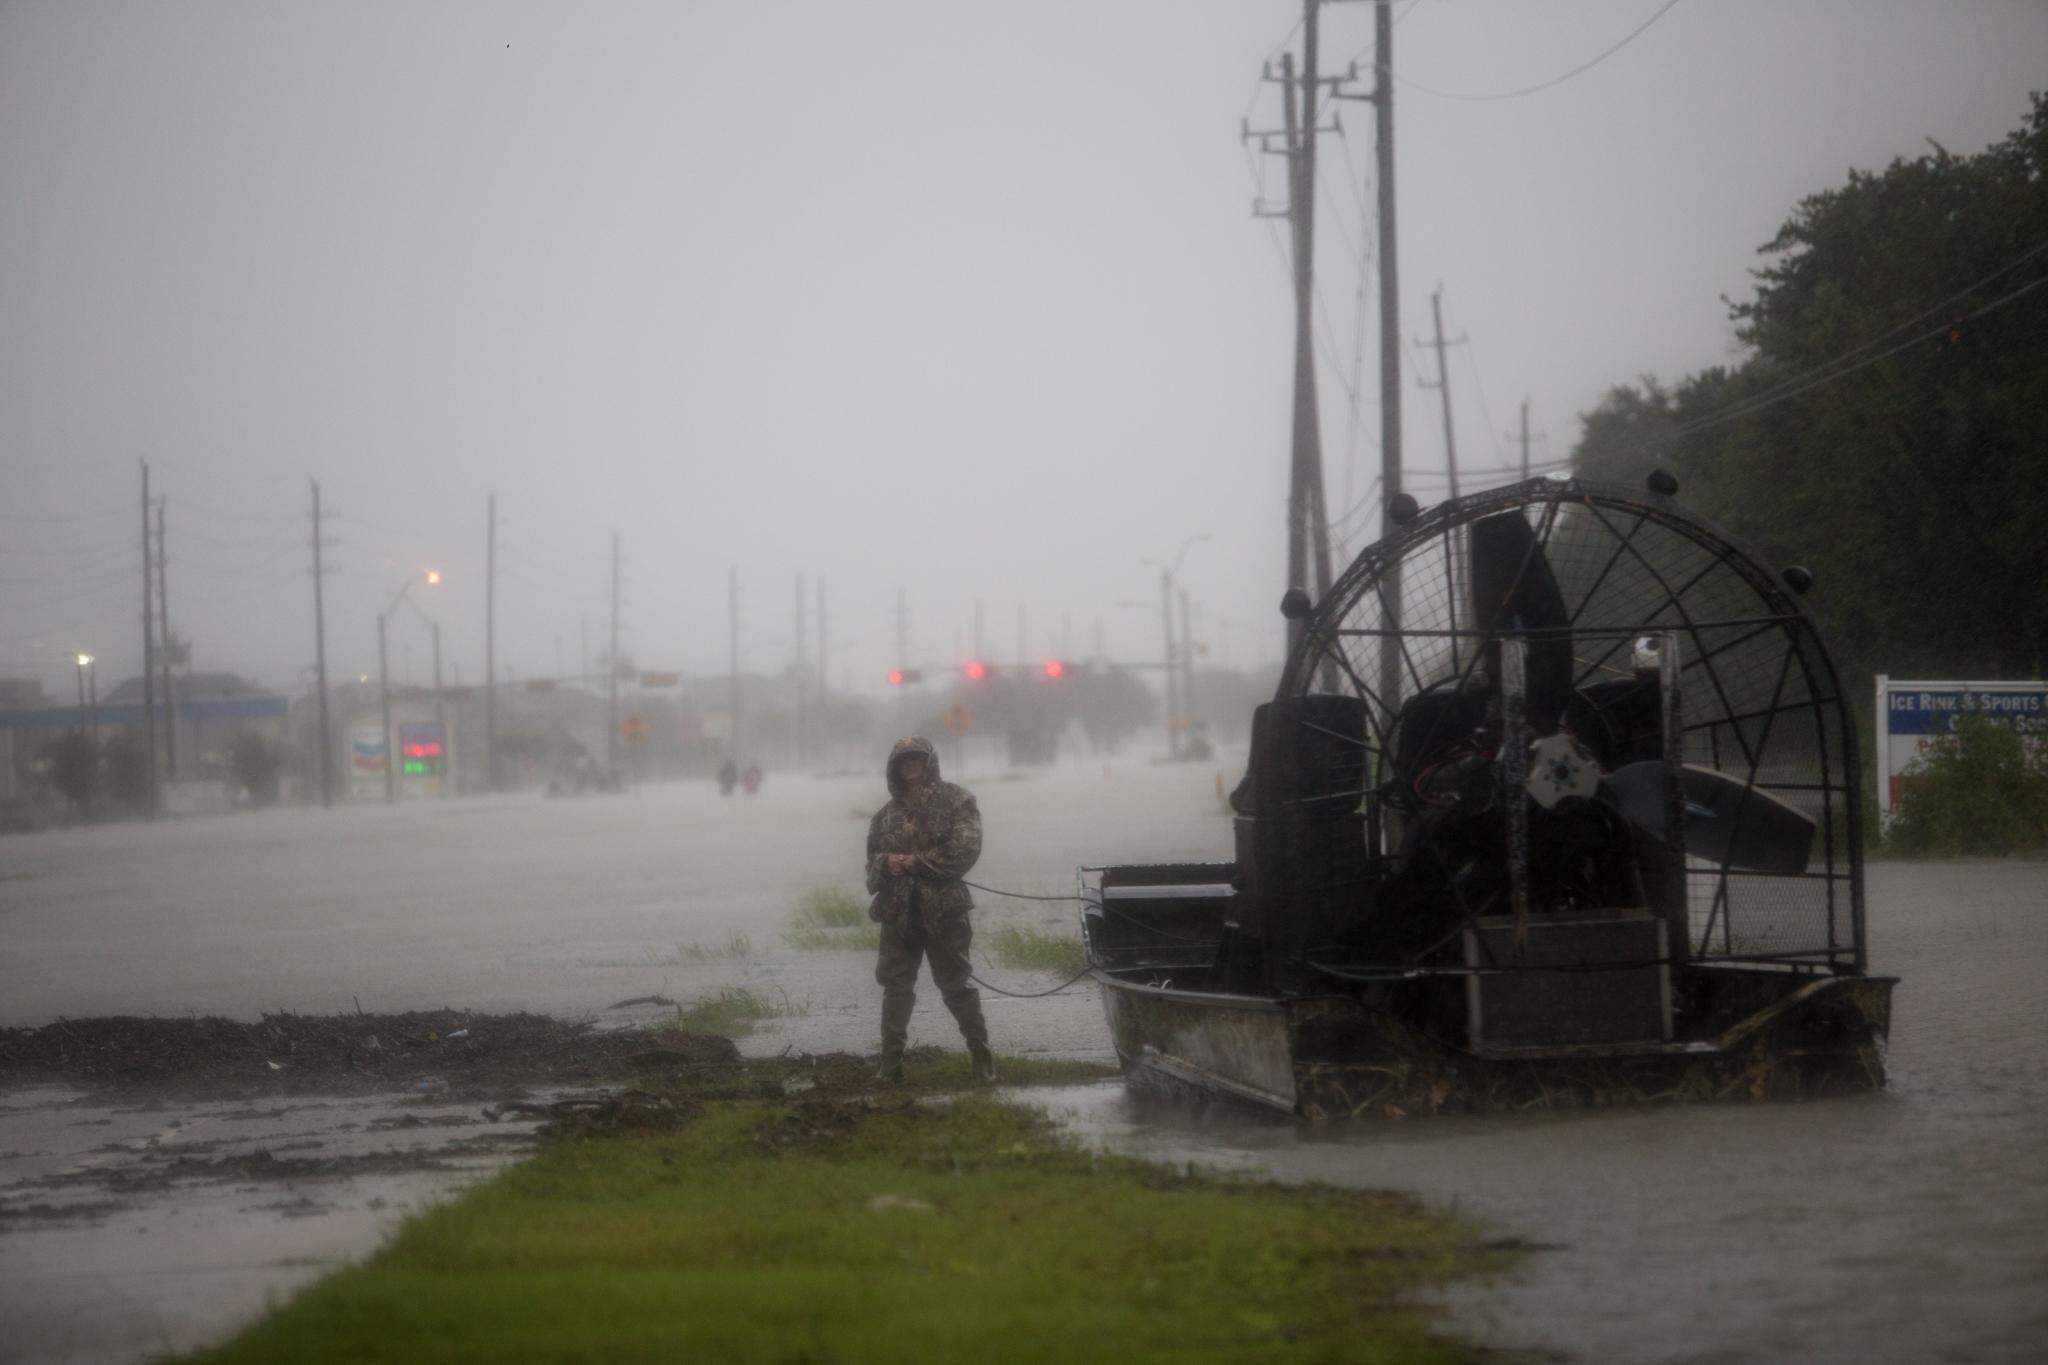 2017-08-28_Hurricane_Harvey_Harlem_Boat_Pu.Ying.Huang0019.jpg